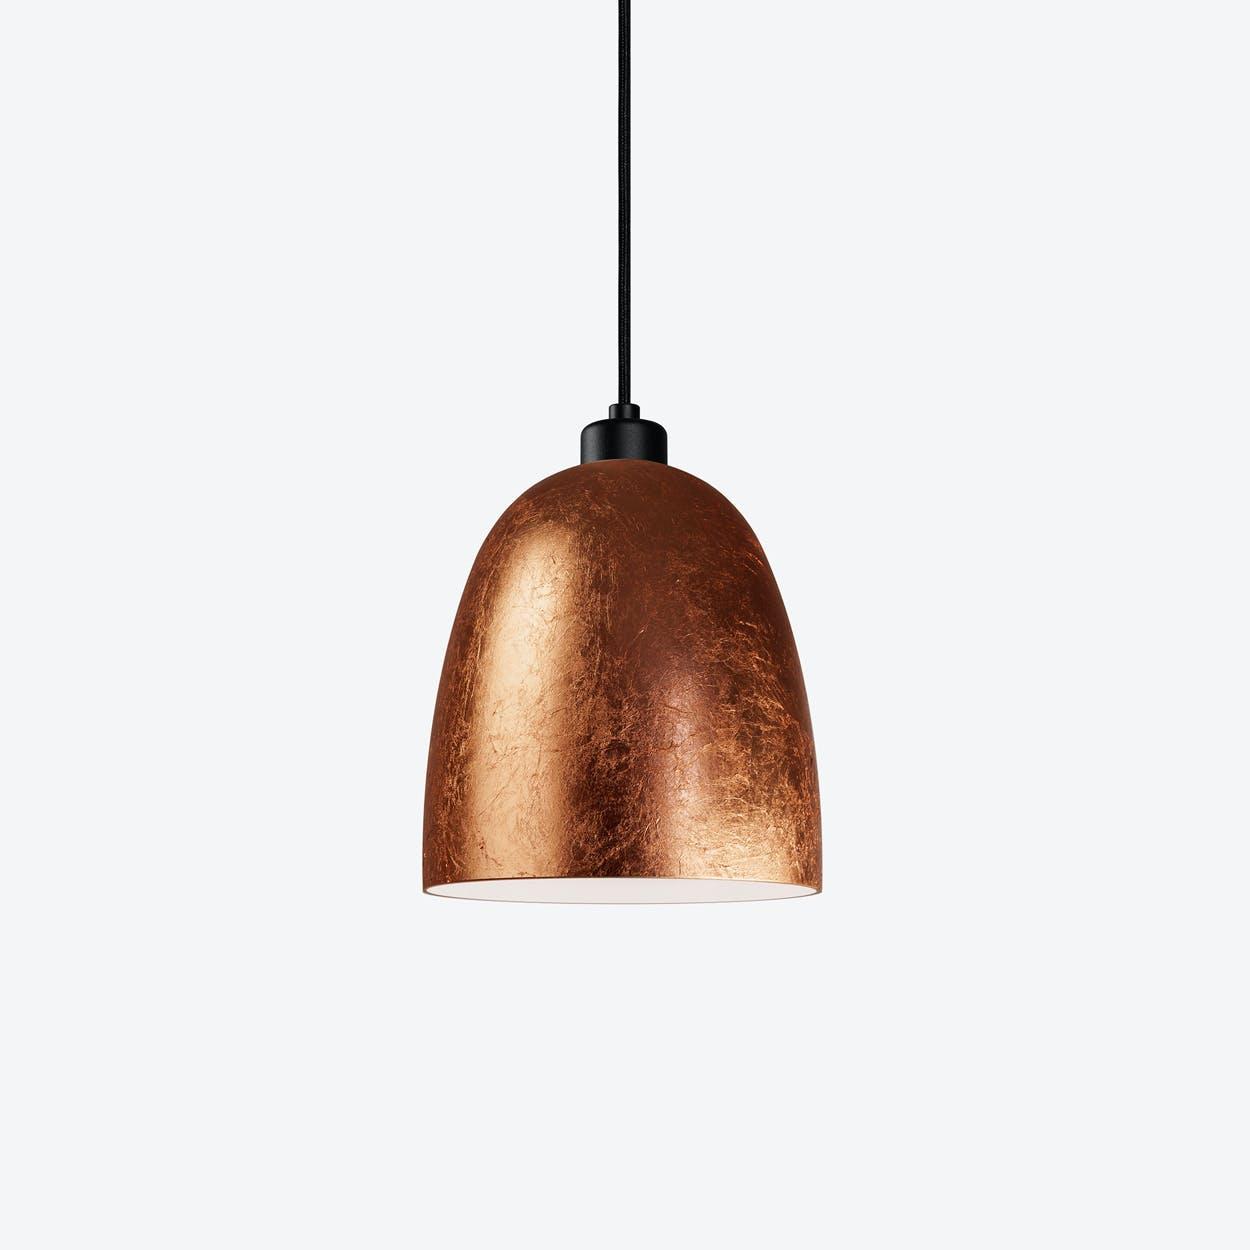 AWA Single Pendant Light in Copper Leaf